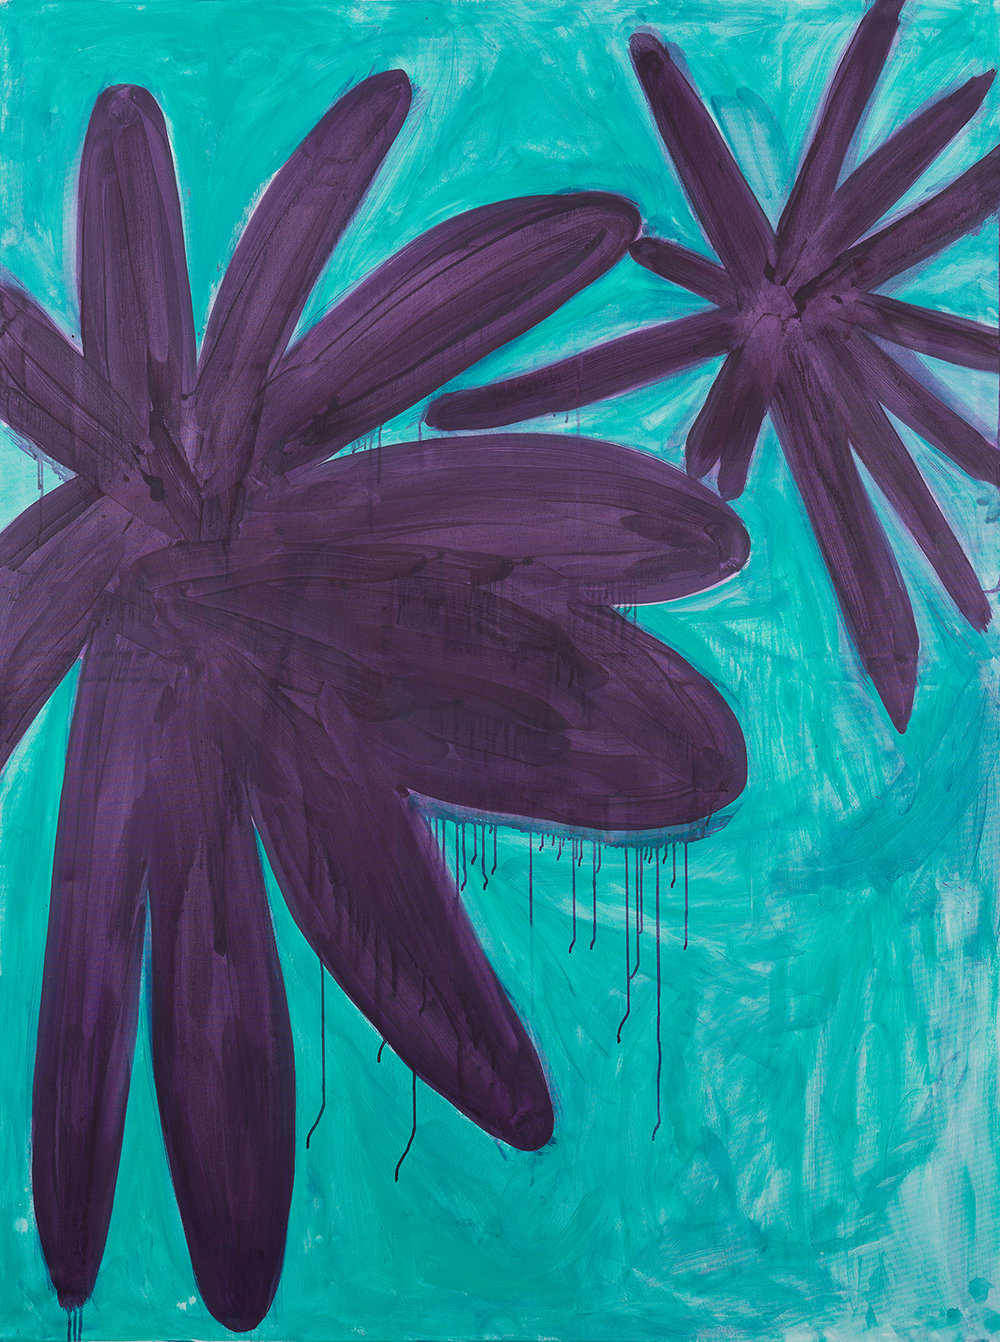 big flower, violett, turquois, 2014